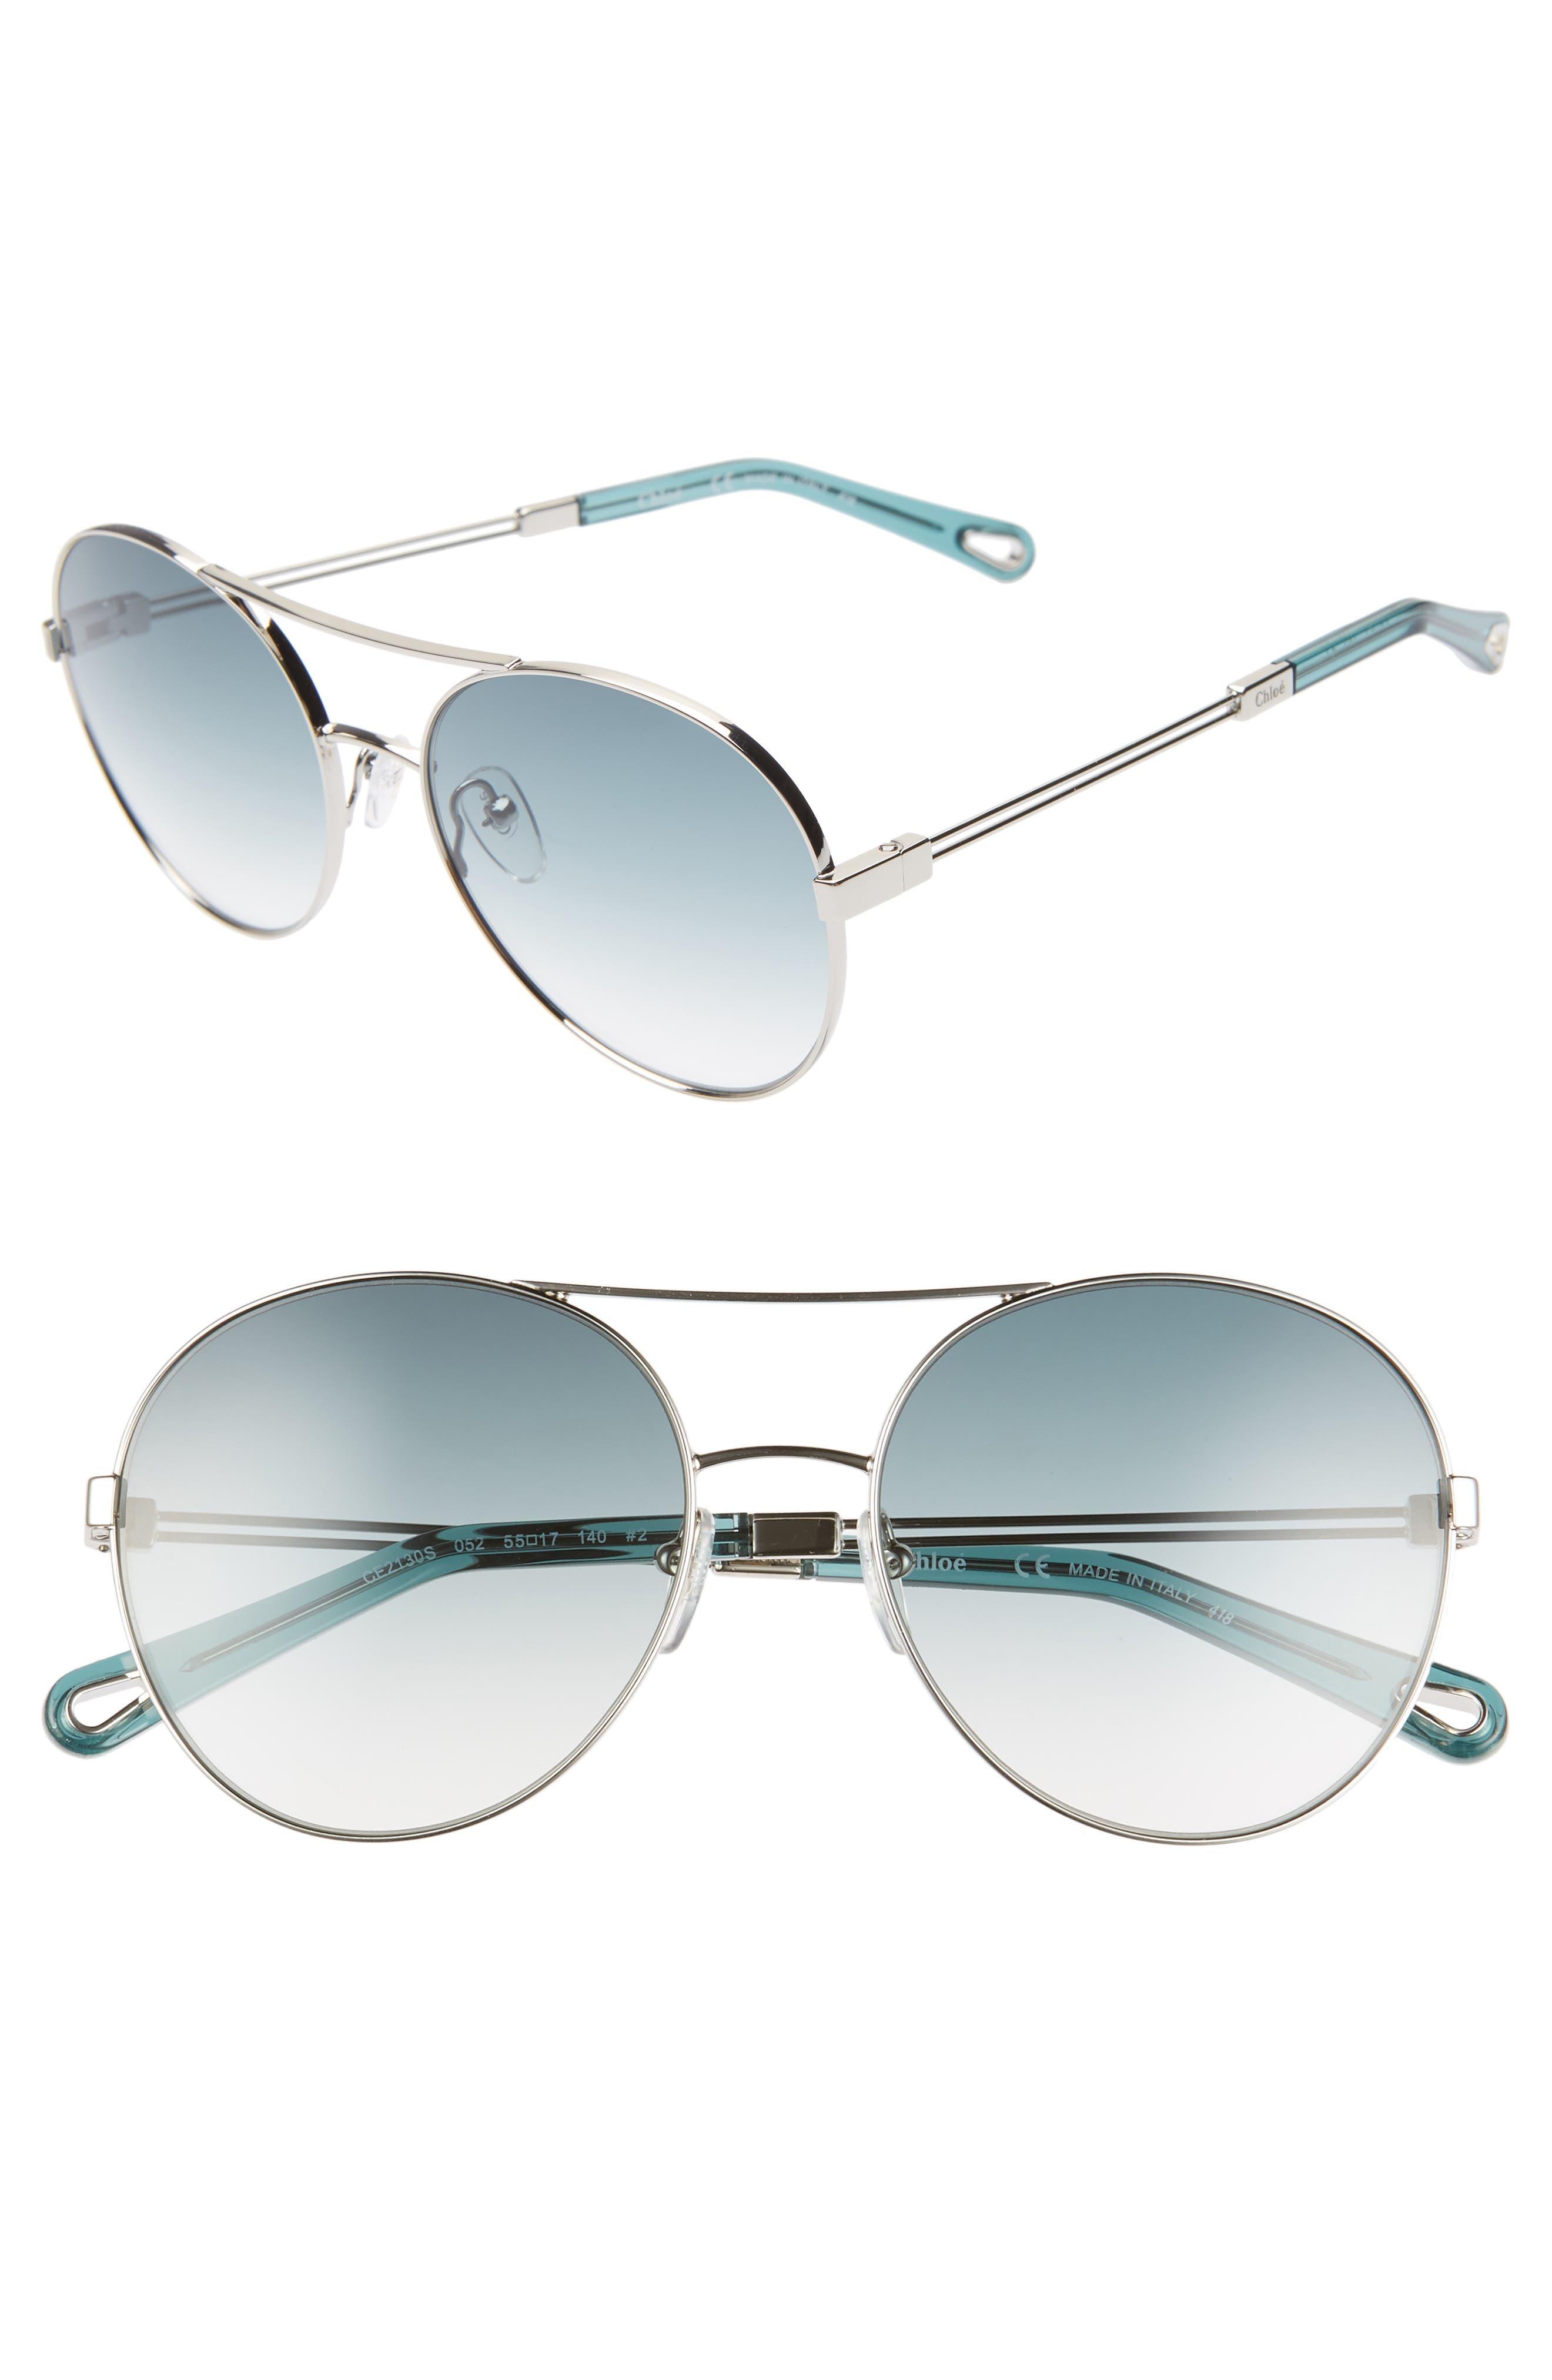 Jacky 55mm Gradient Aviator Sunglasses by ChloÉ